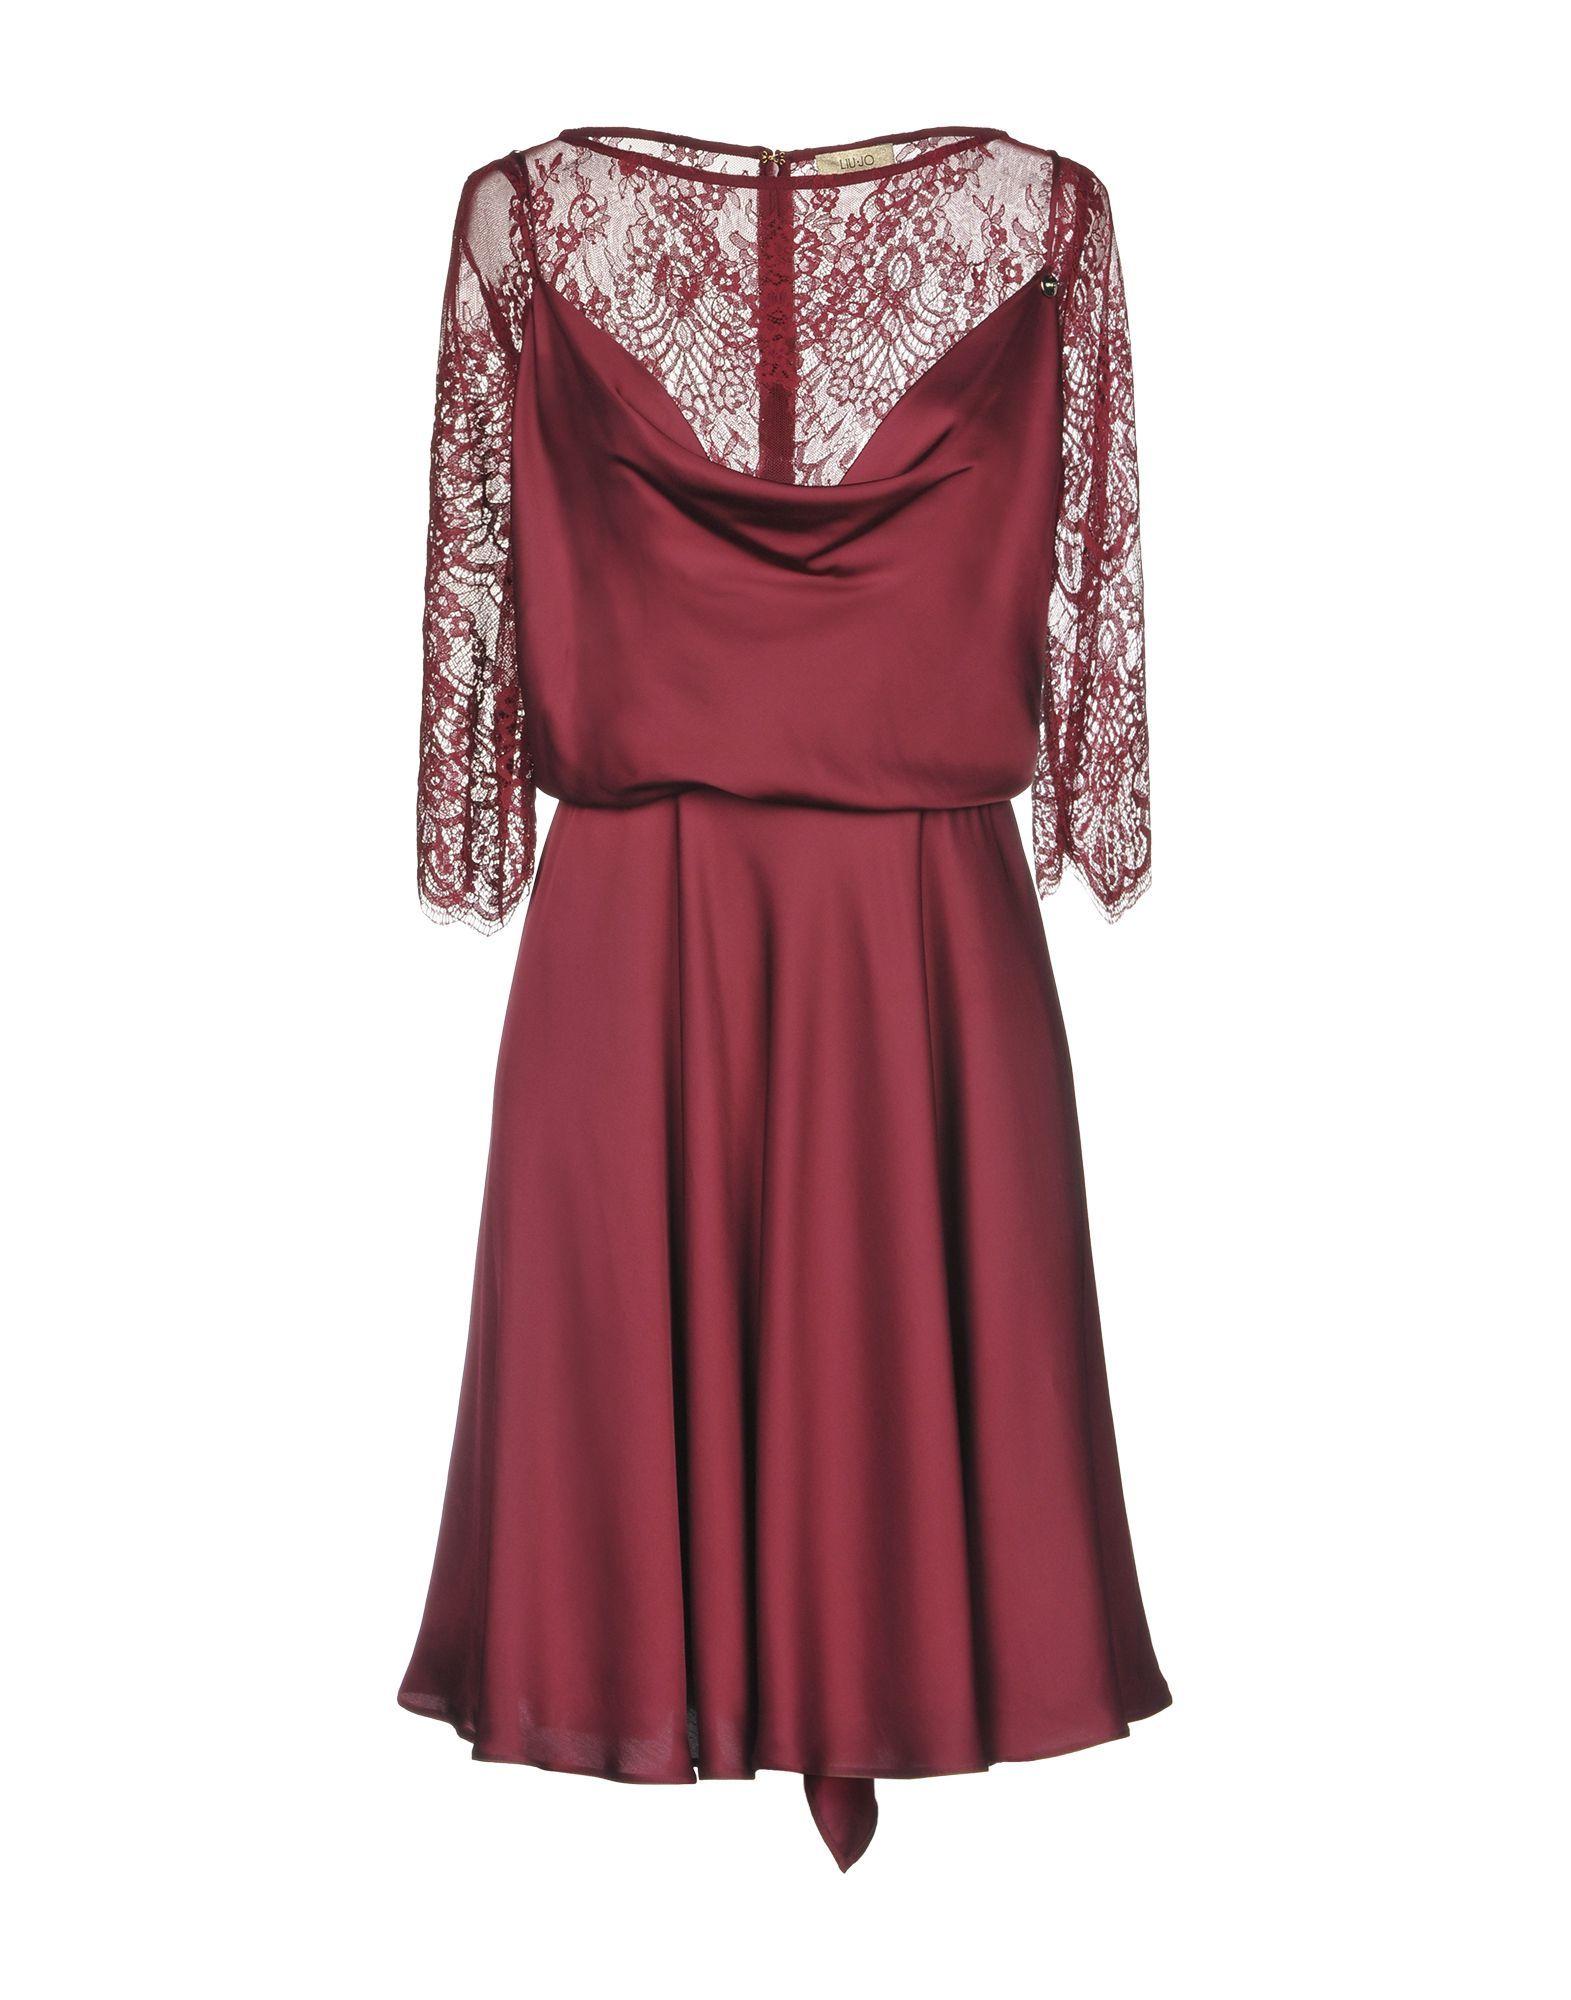 Liu Jo Maroon Lace Sleeve Dress